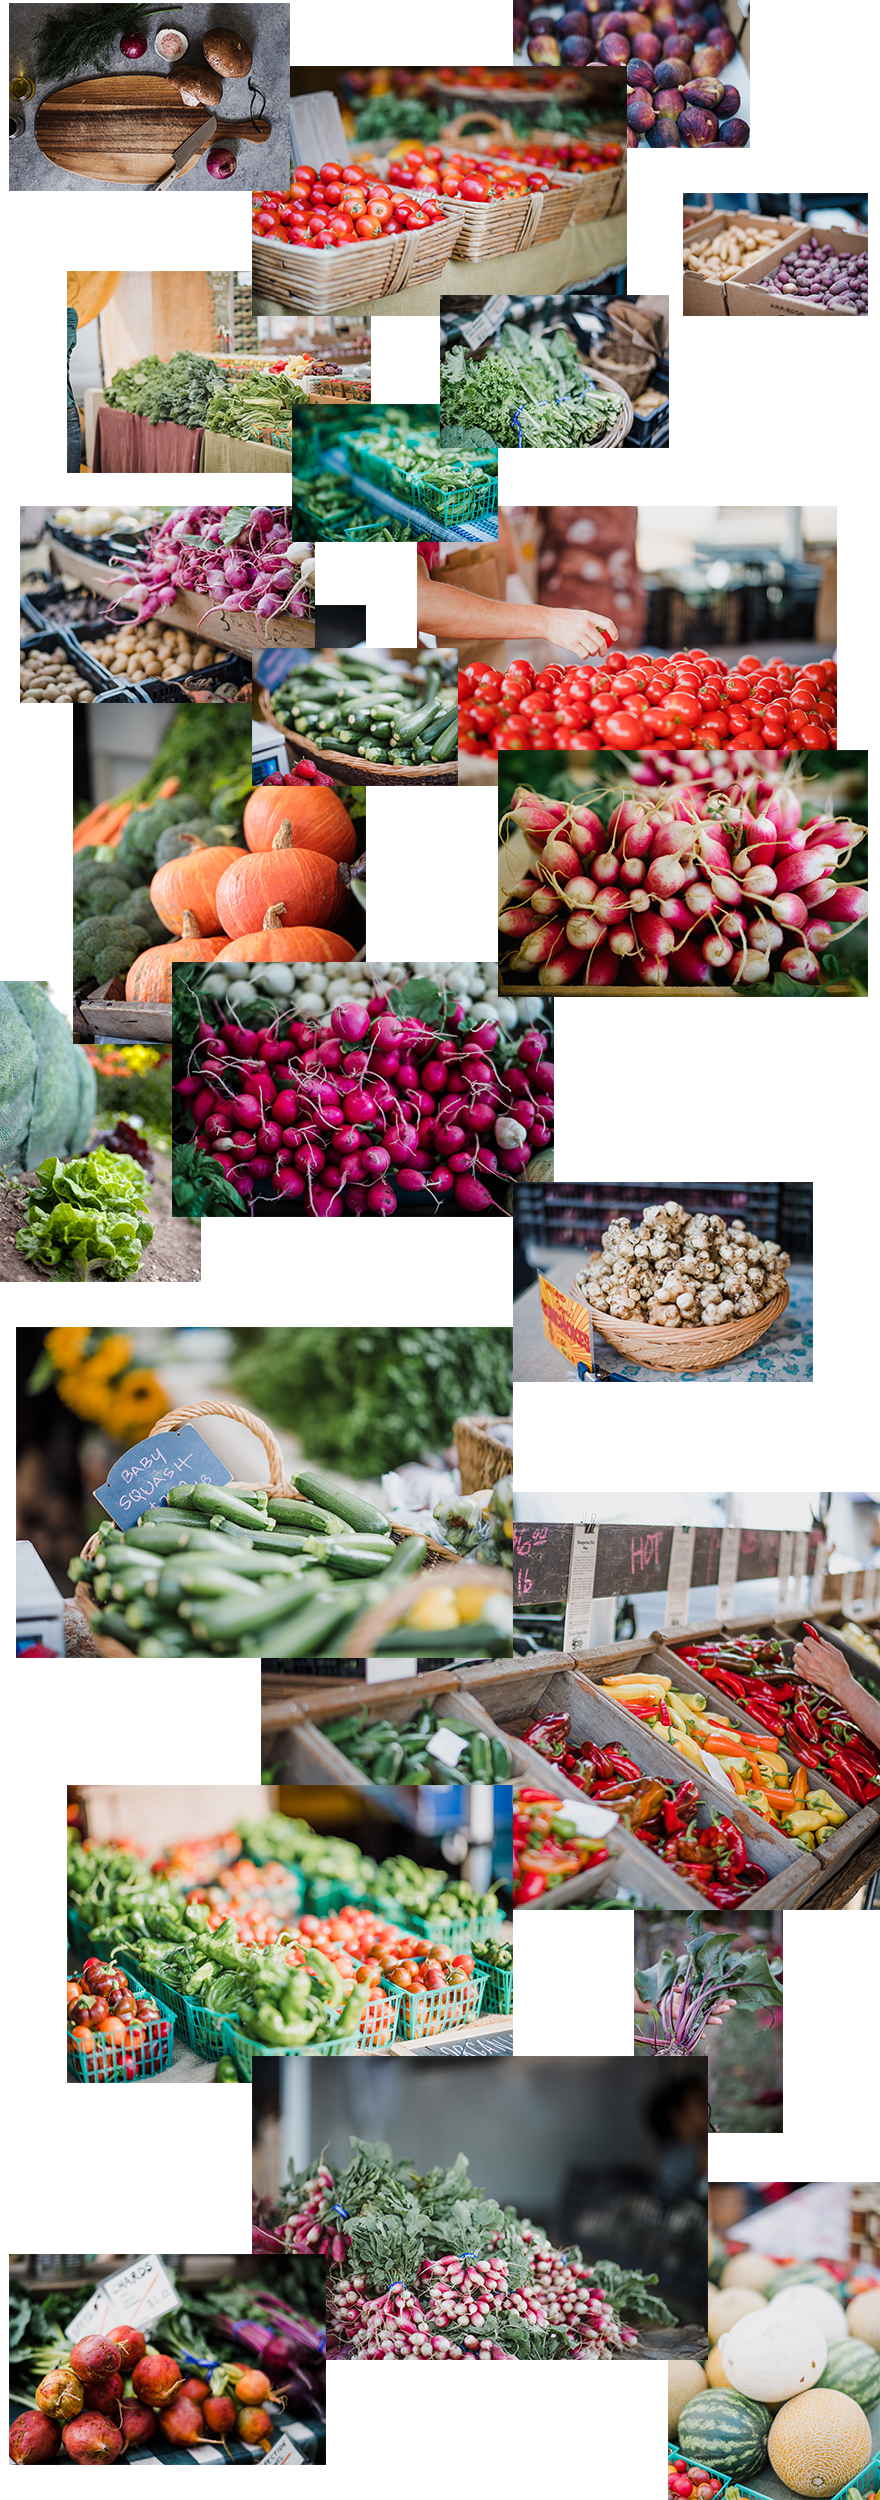 divi-farmers-market-layout-pack-image-assets